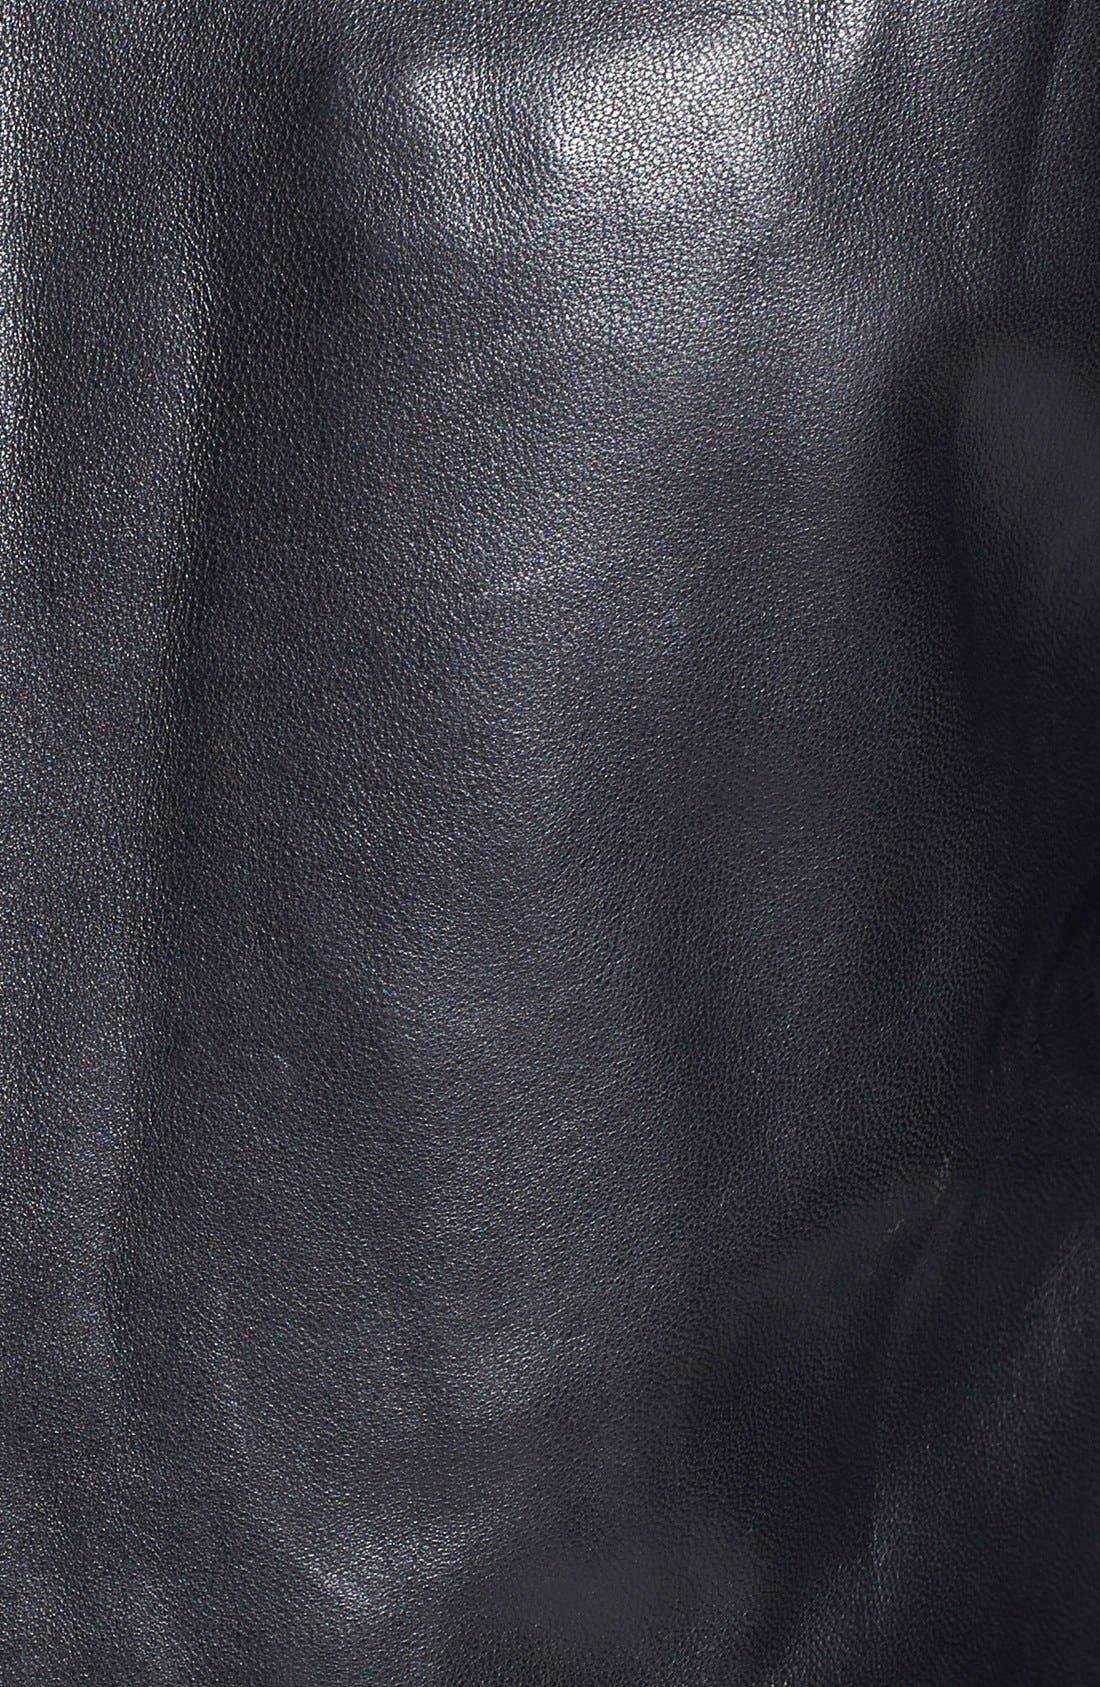 'Bane' Sheepskin Leather Jacket,                             Alternate thumbnail 2, color,                             001